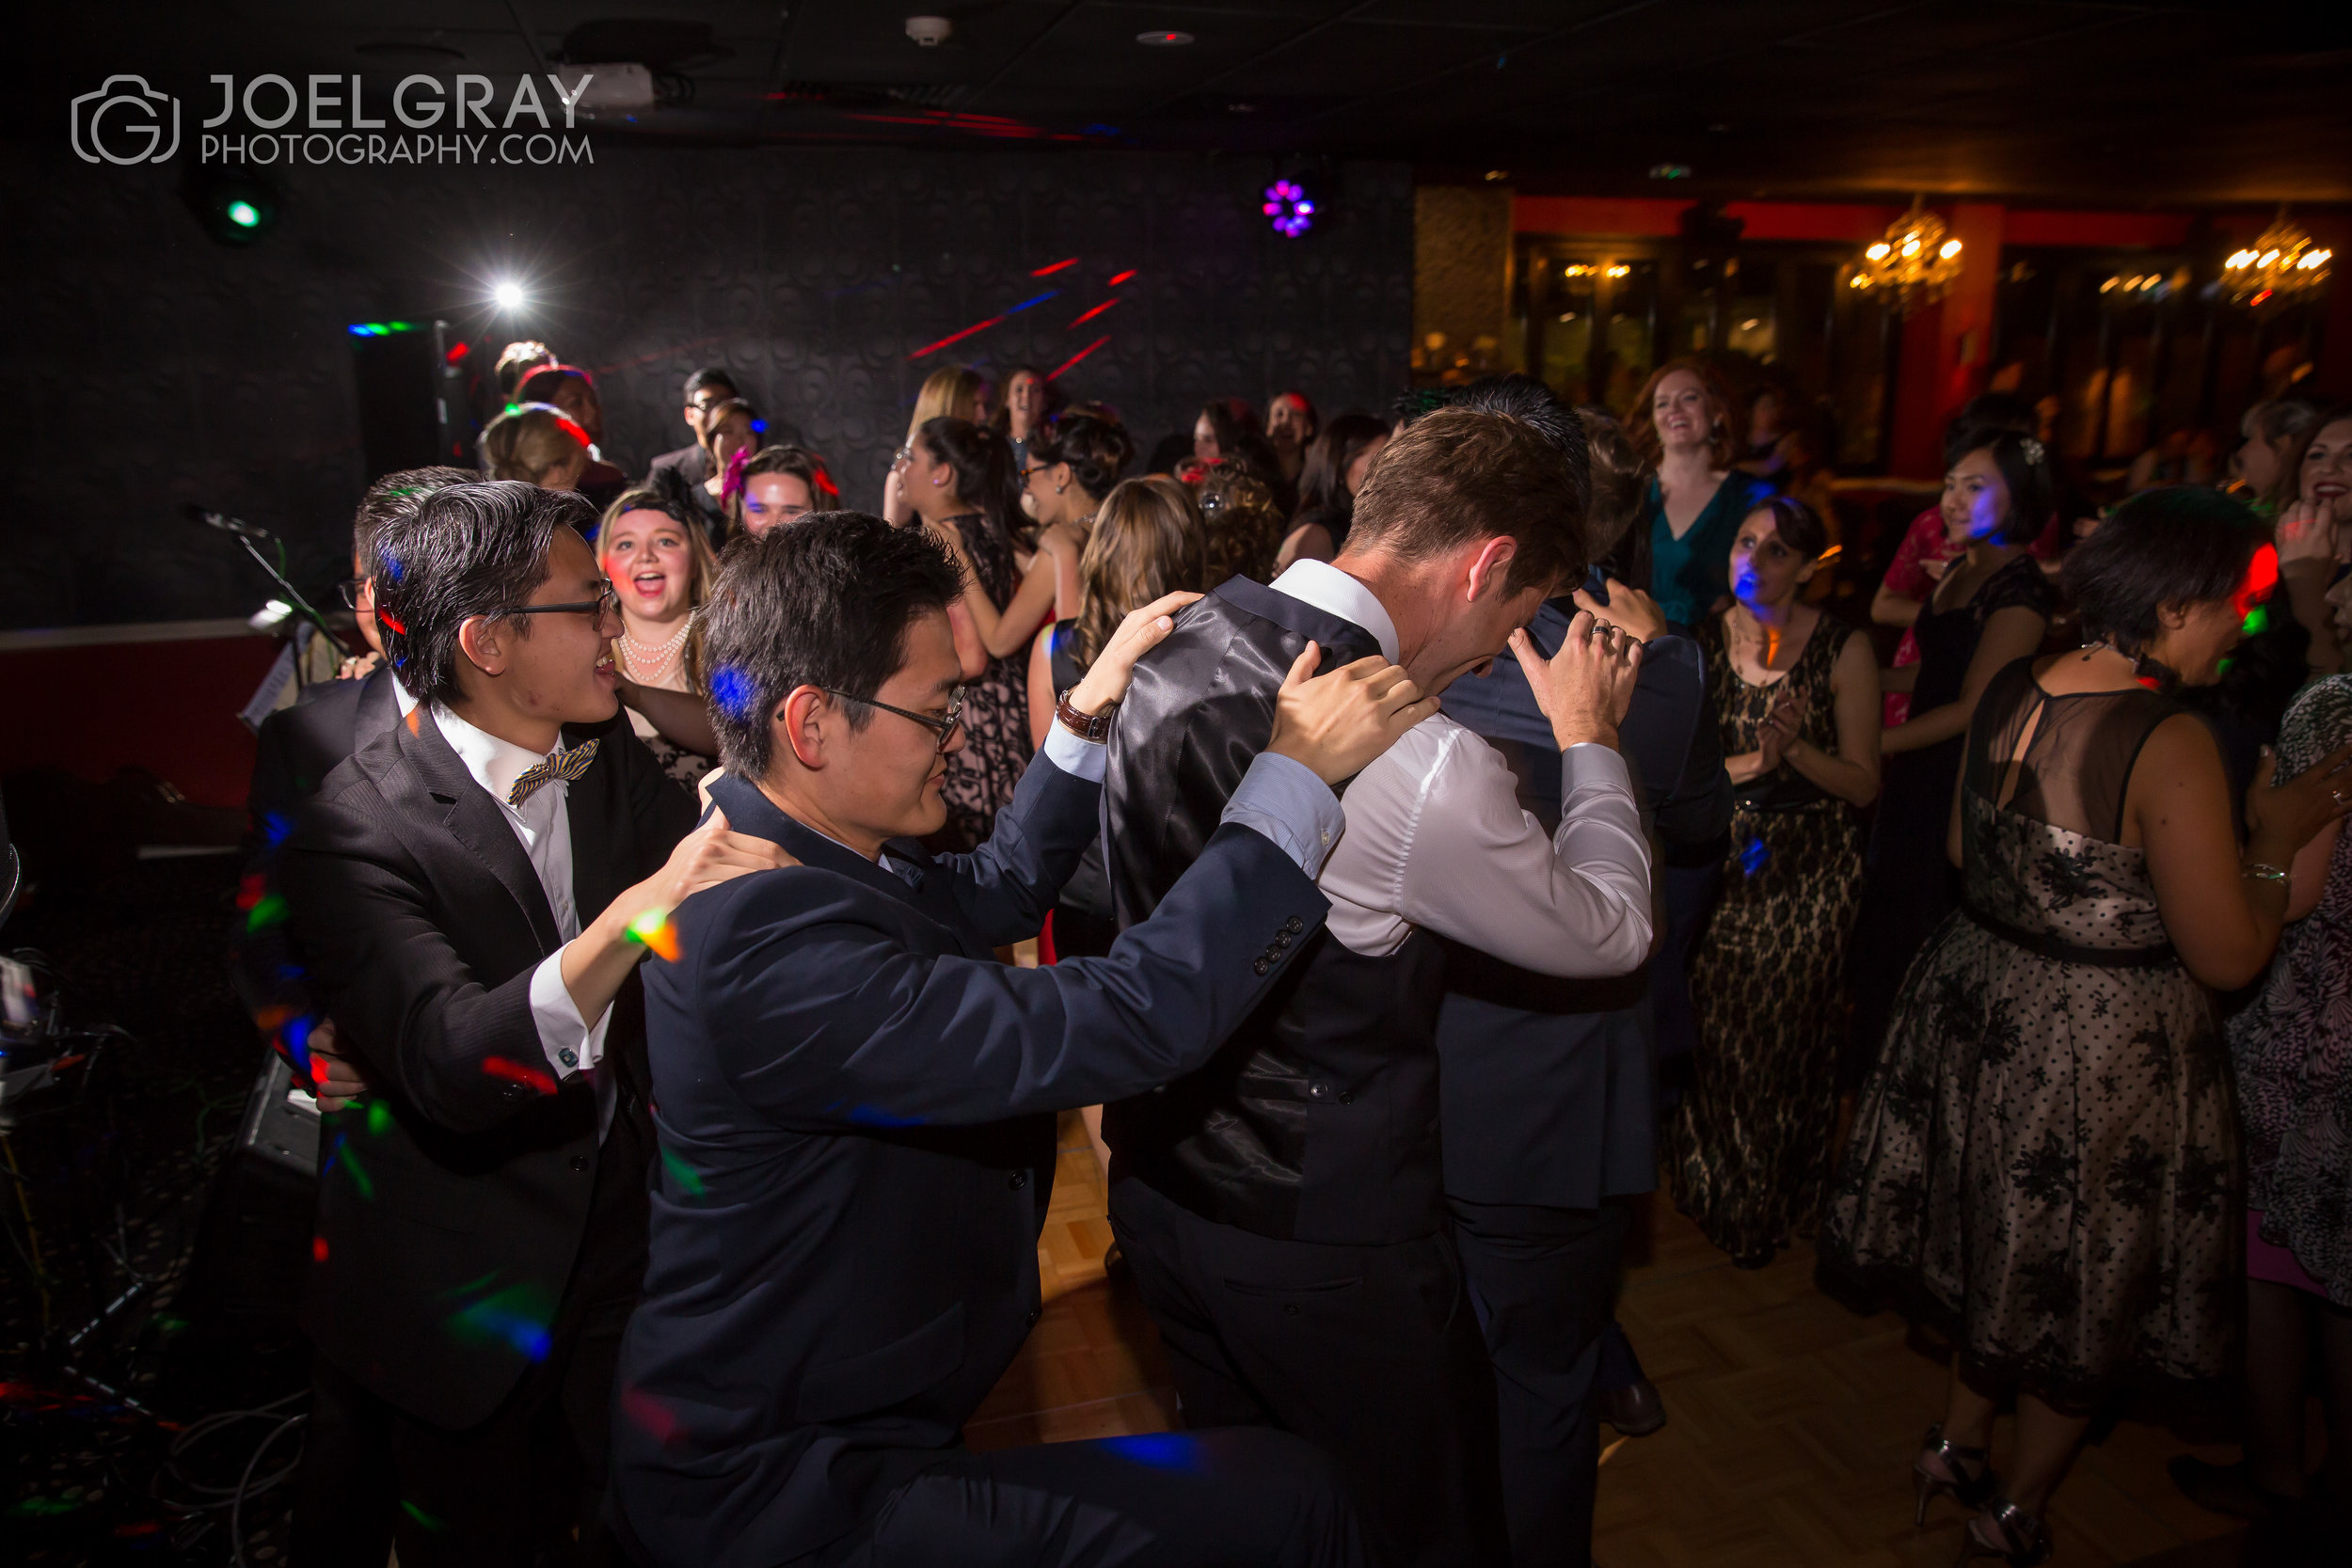 sydney-event-photographer-lilys-dance-floor-photograpy-1800829994